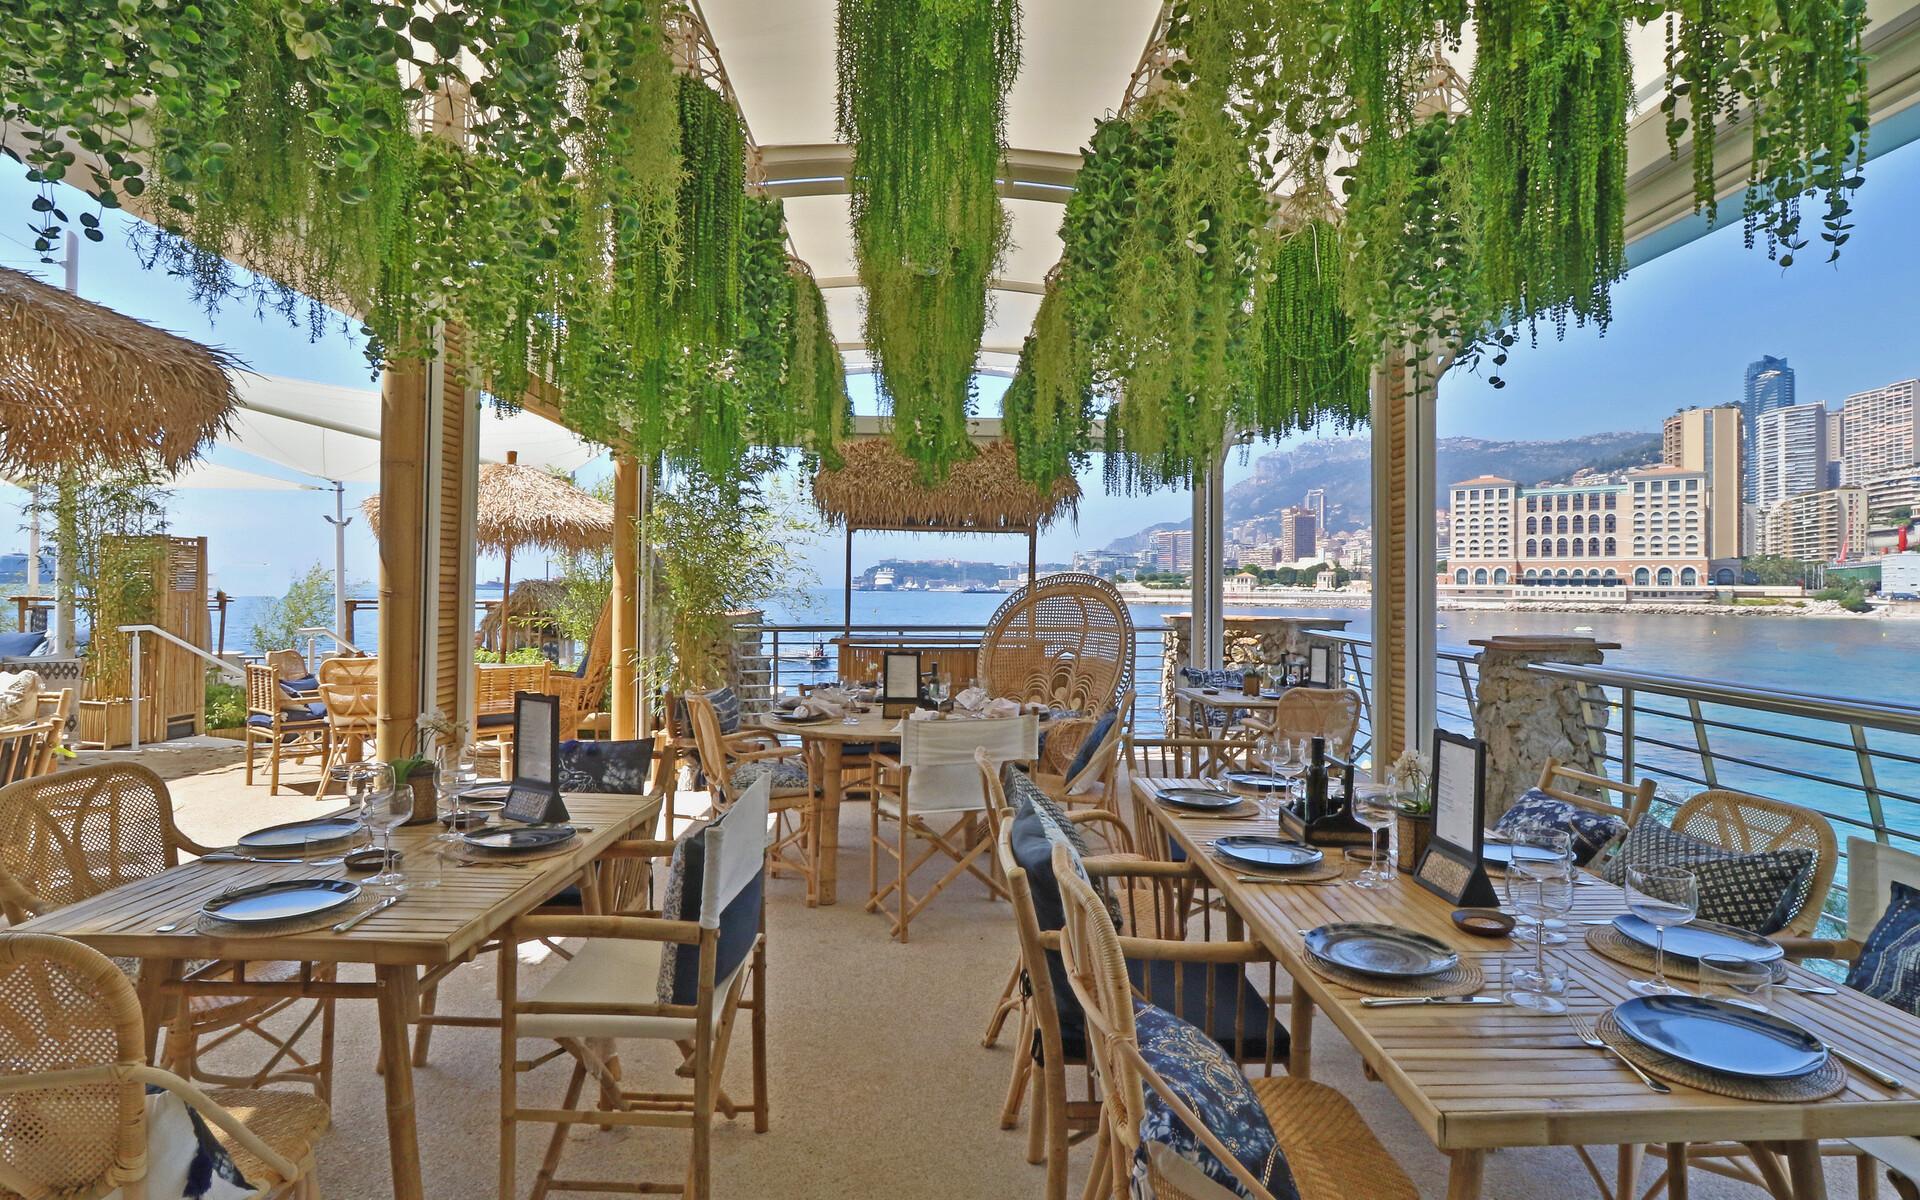 Monte-Carlo Beach - Restaurant & Lounge La Vigie - 2019